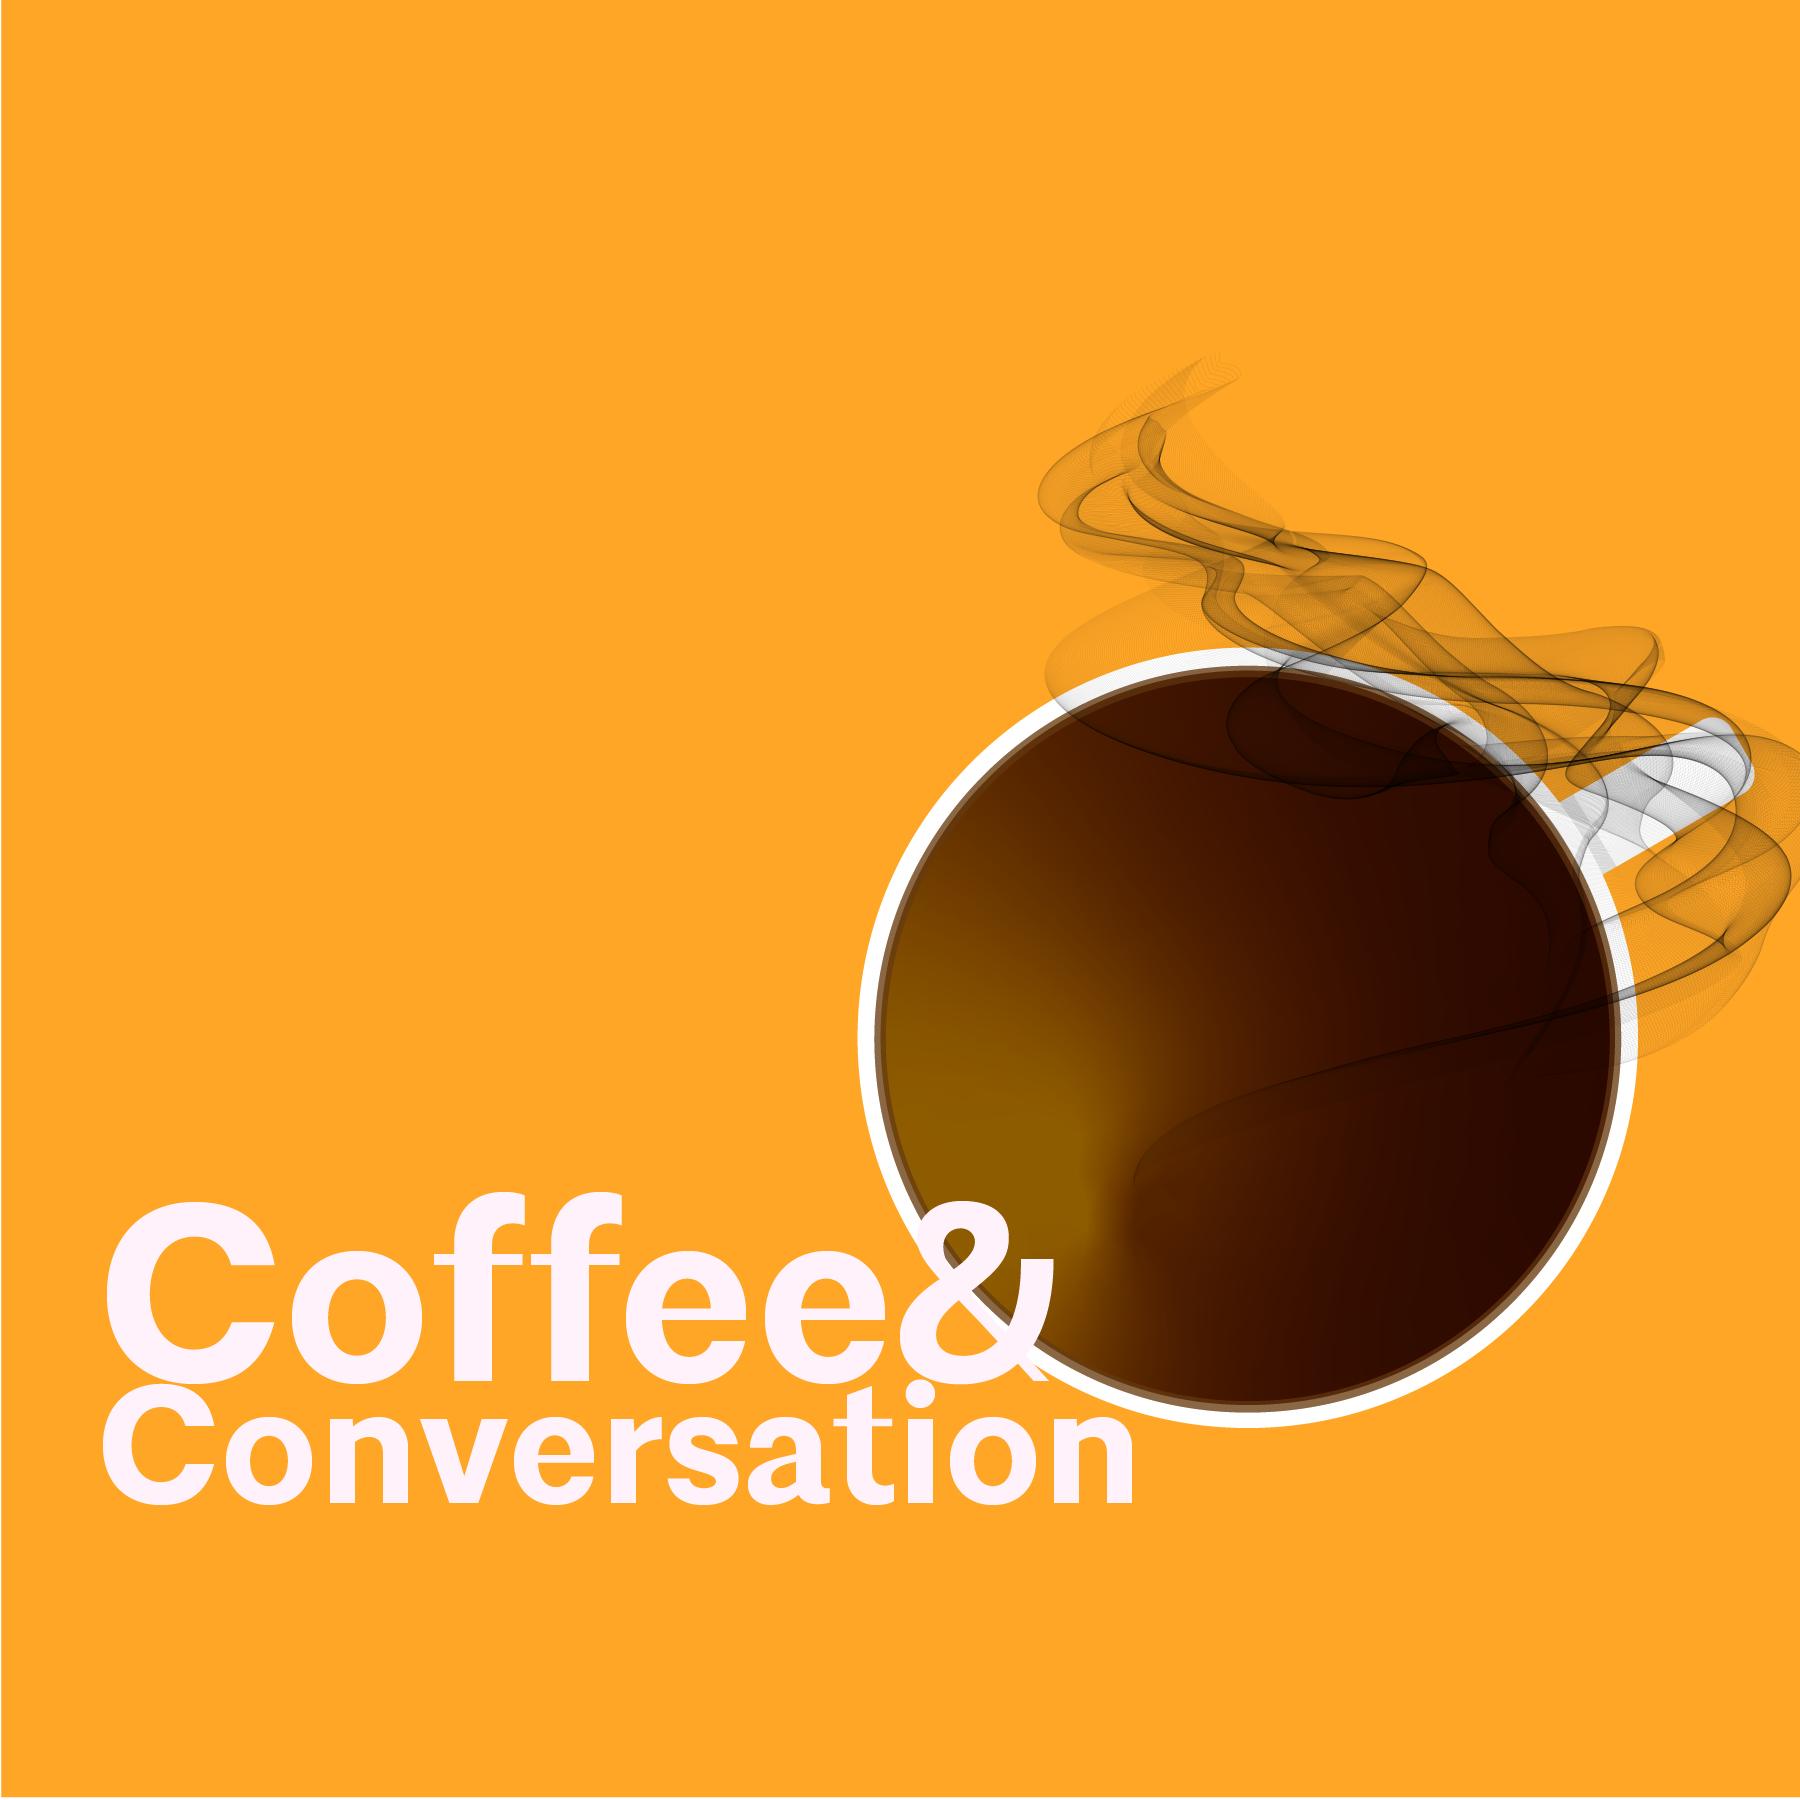 Coffee & Conversation